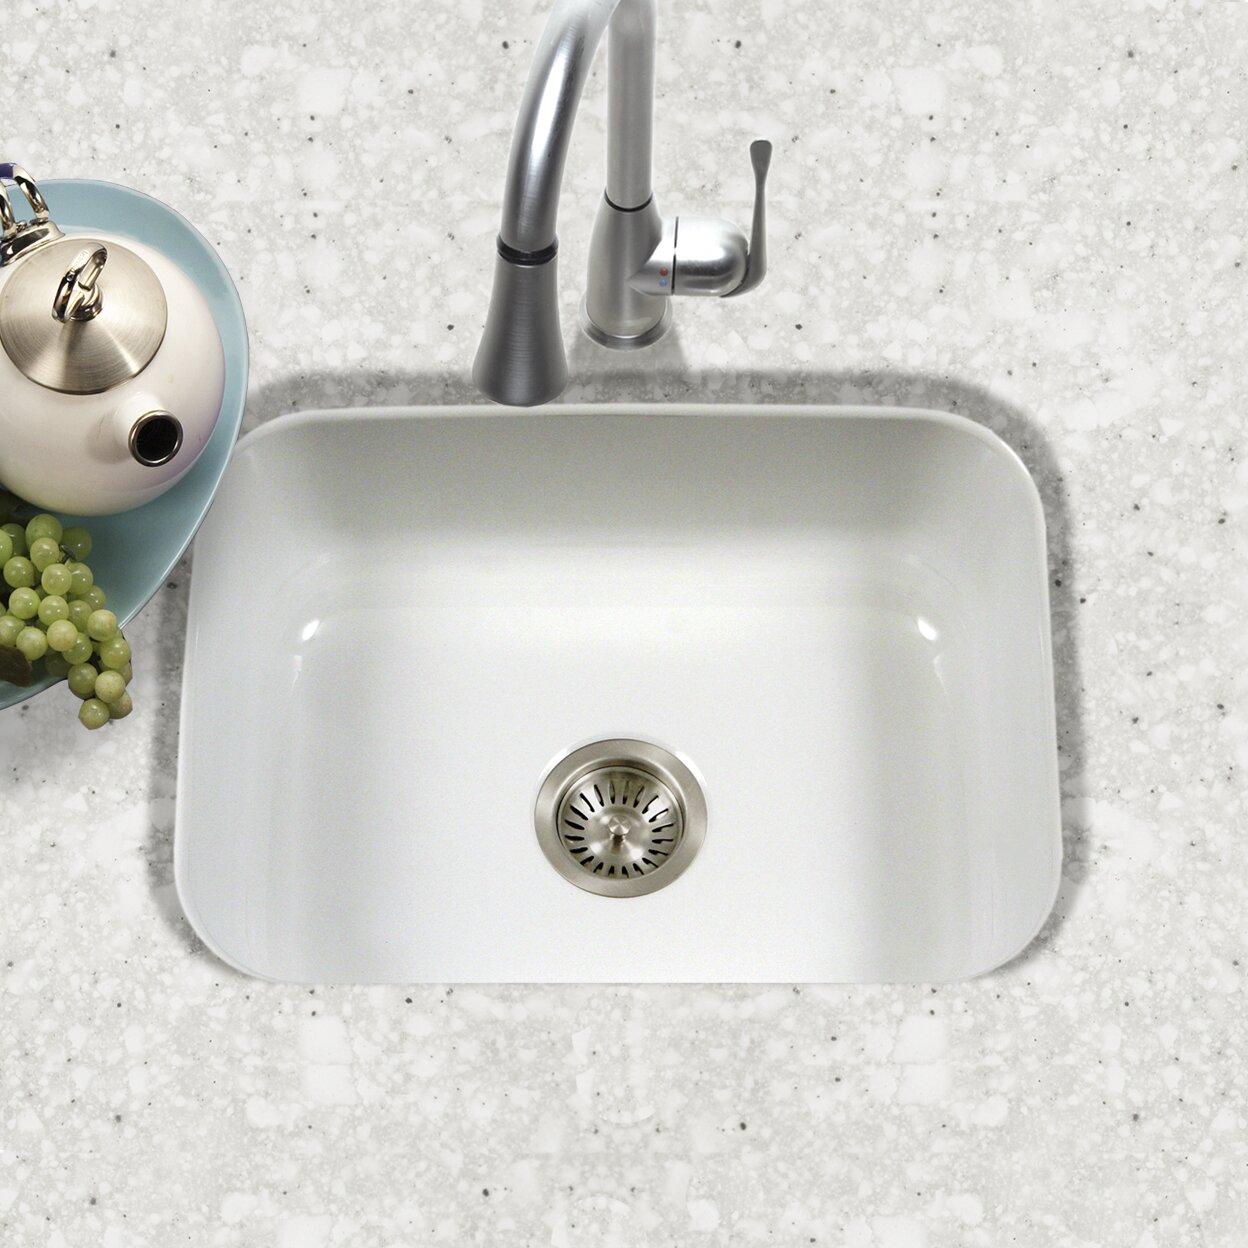 White Enamel Kitchen Sinks Houzer Porcela 2276 X 174 Porcelain Enamel Steel Undermount